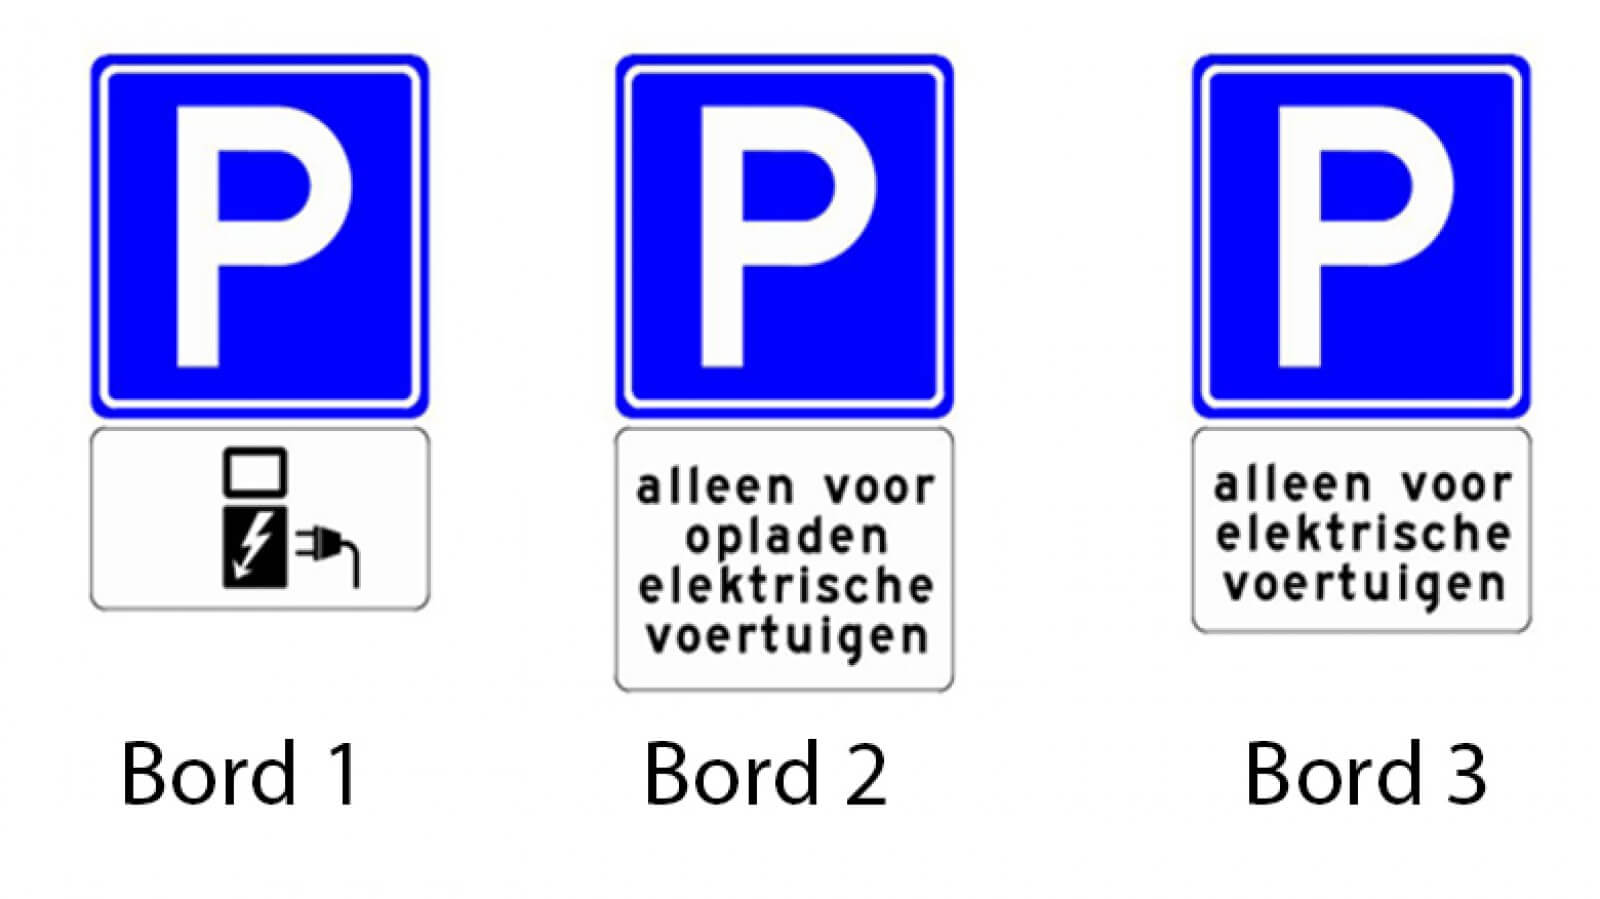 openbare laadpaal parkeerborden